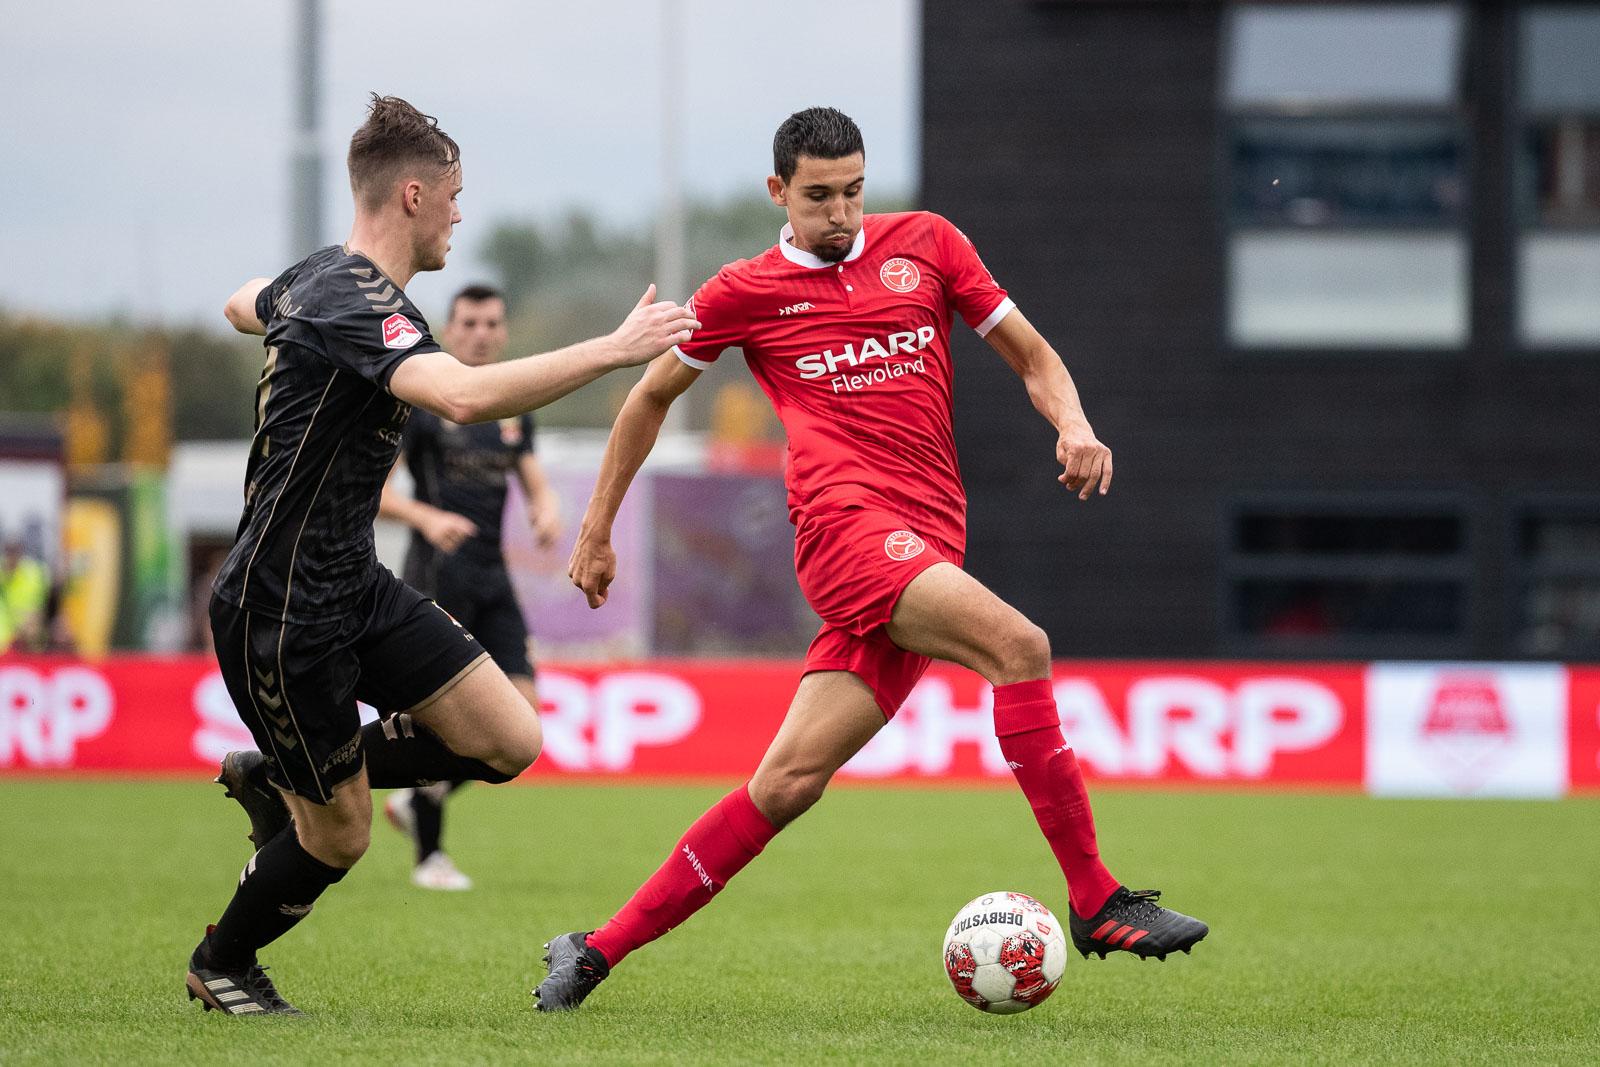 SHARP Flevoland shirtsponsor TOTO KNVB Beker Almere City FC